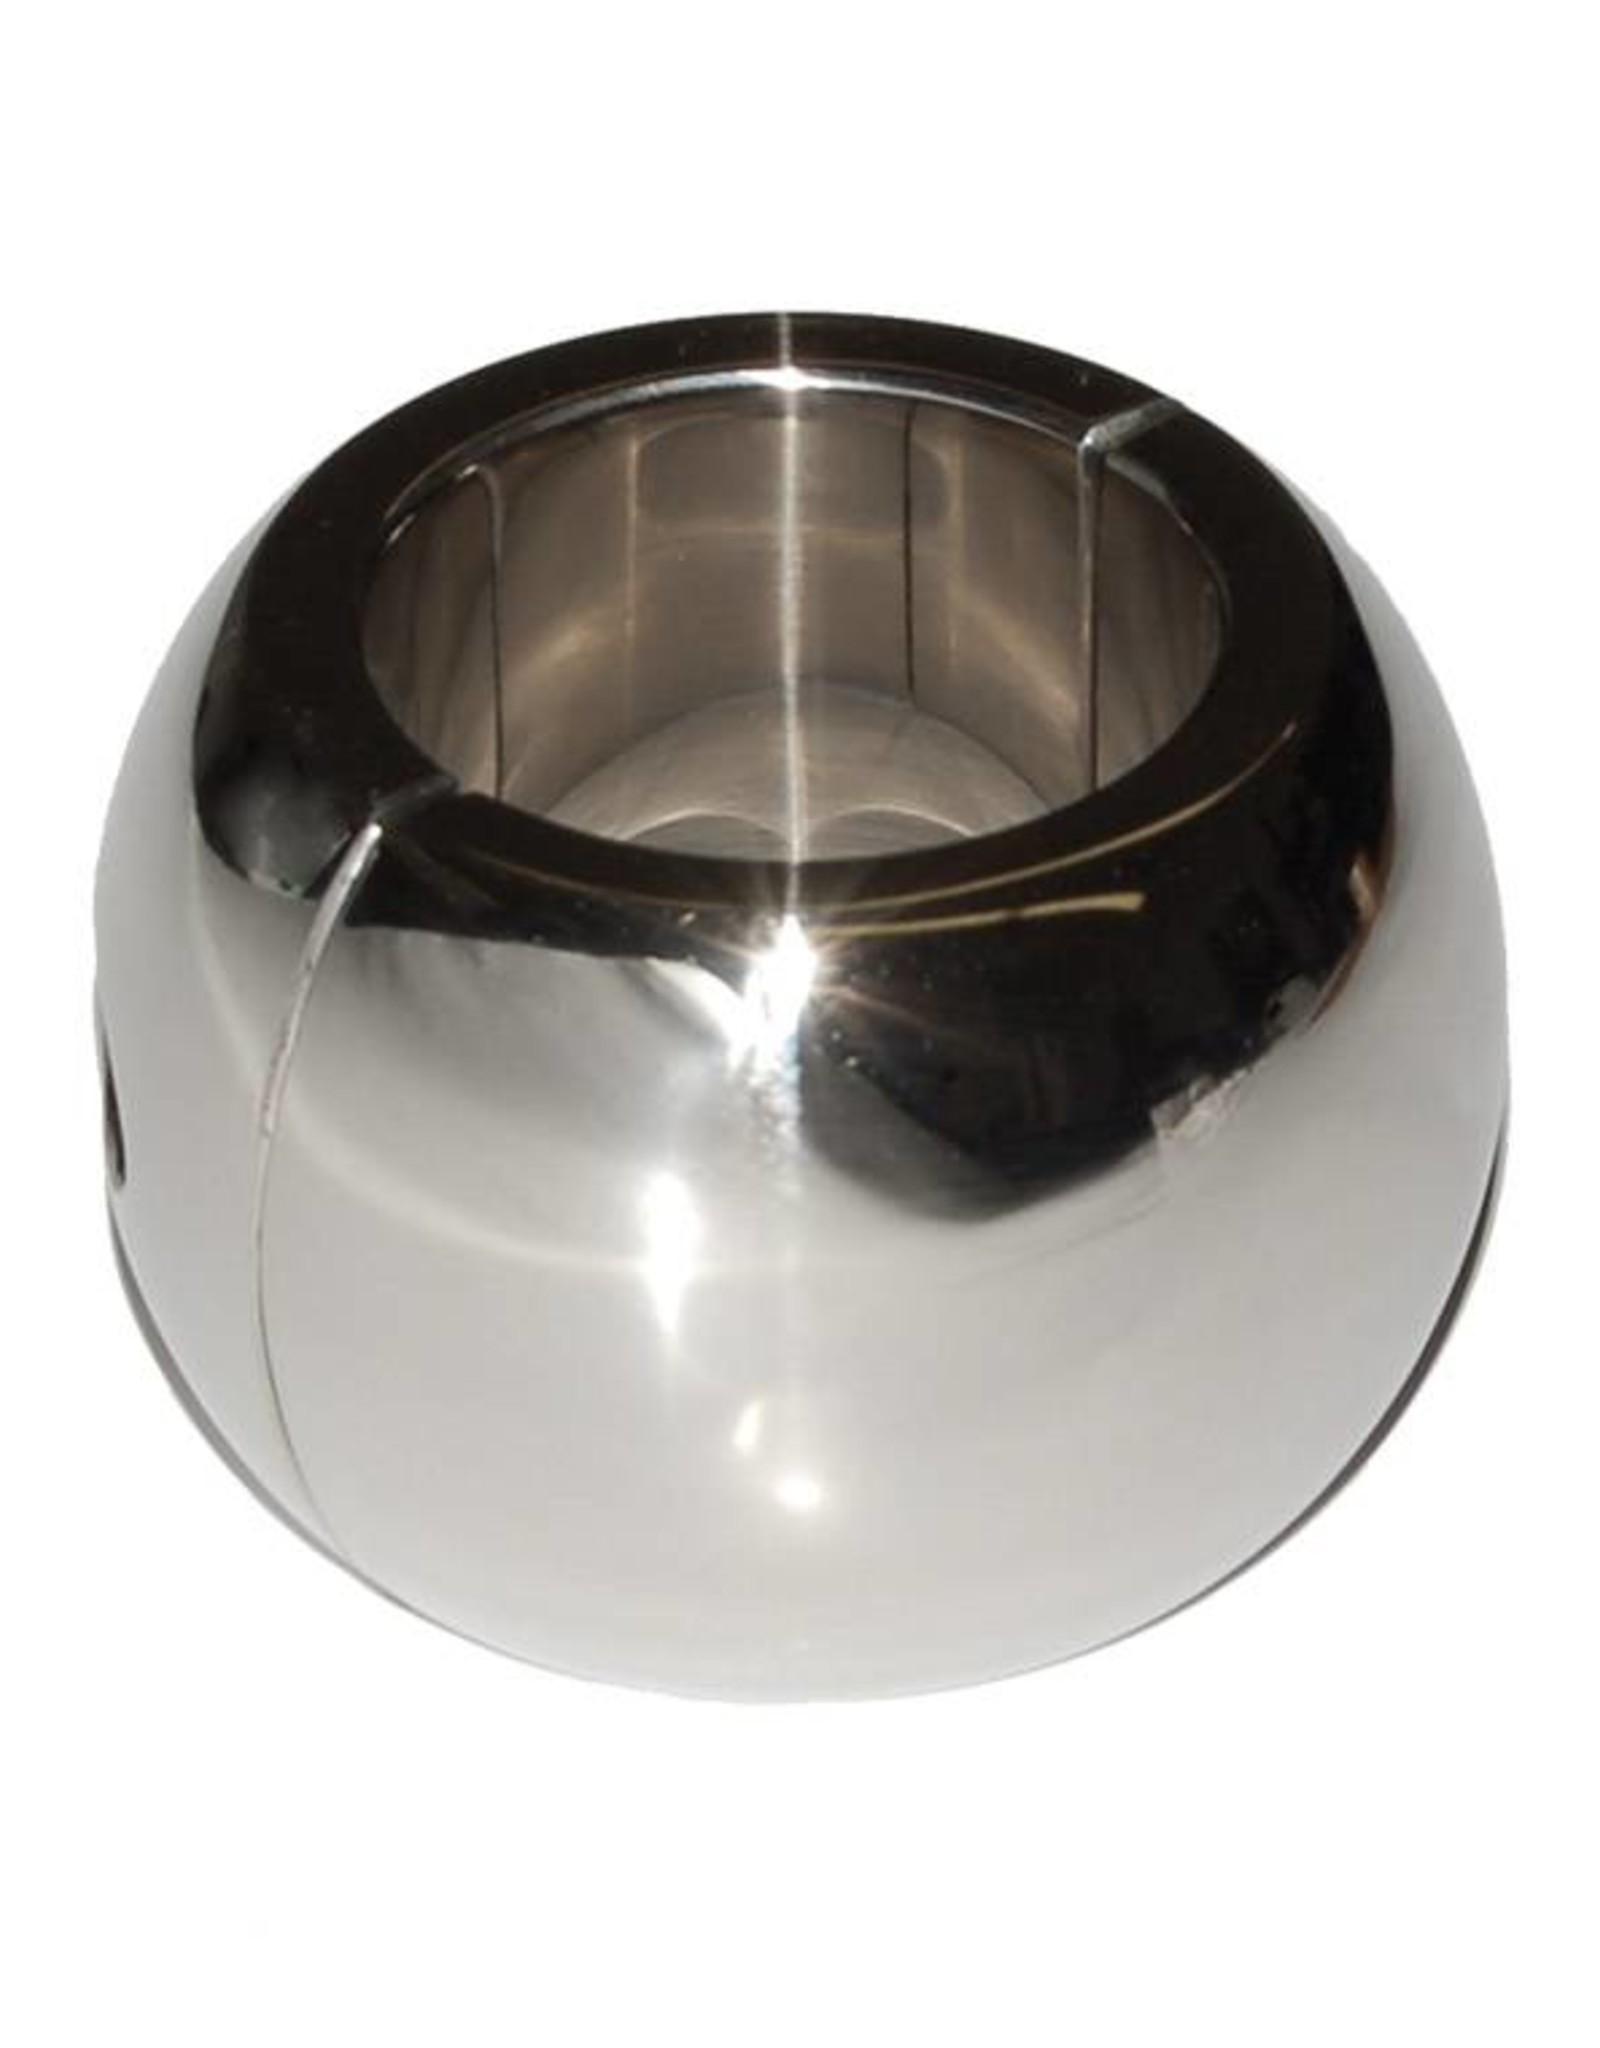 Edelstahl Ball Stretcher oval - 40 x 35mm